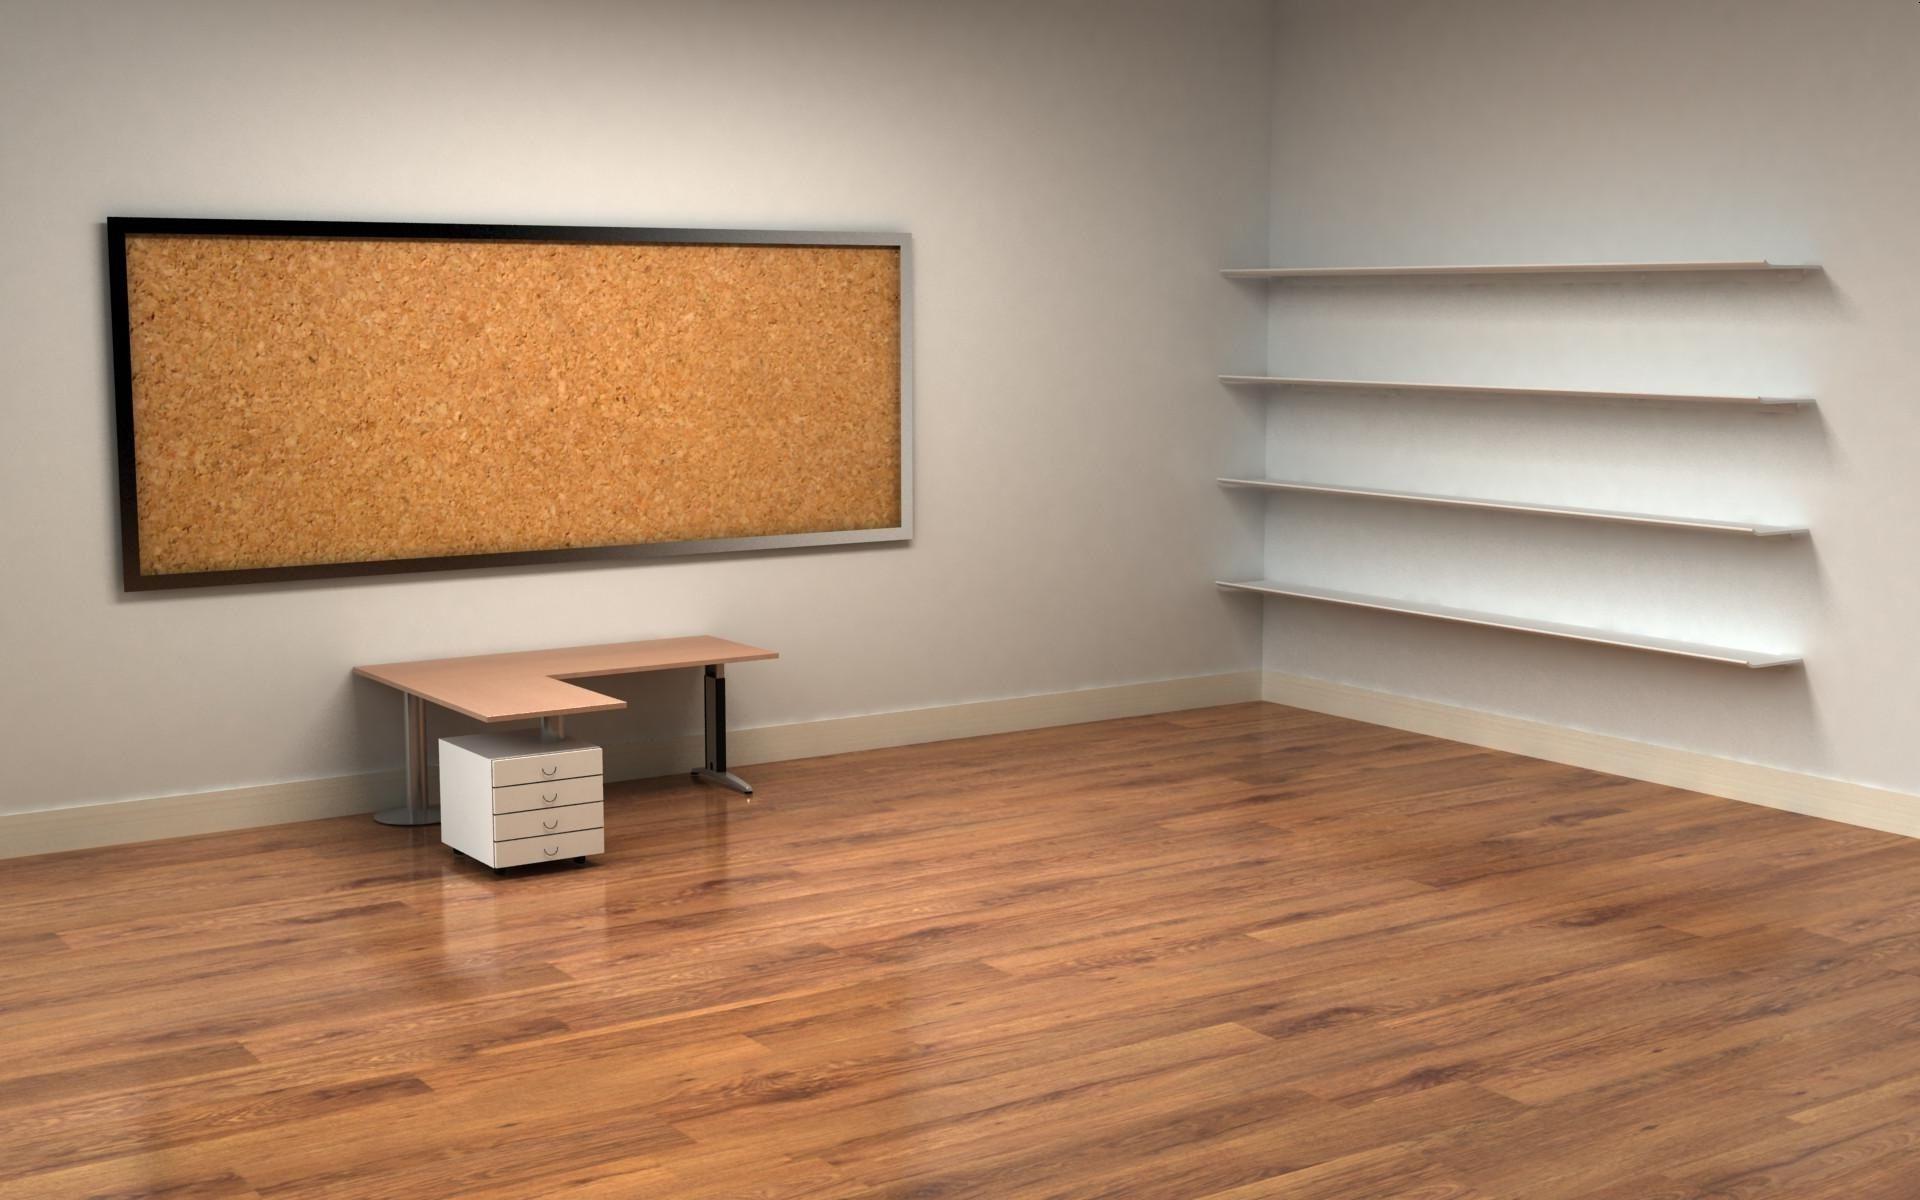 Office interior desks interior designs 1920x1200 for Wallpaper for office wall